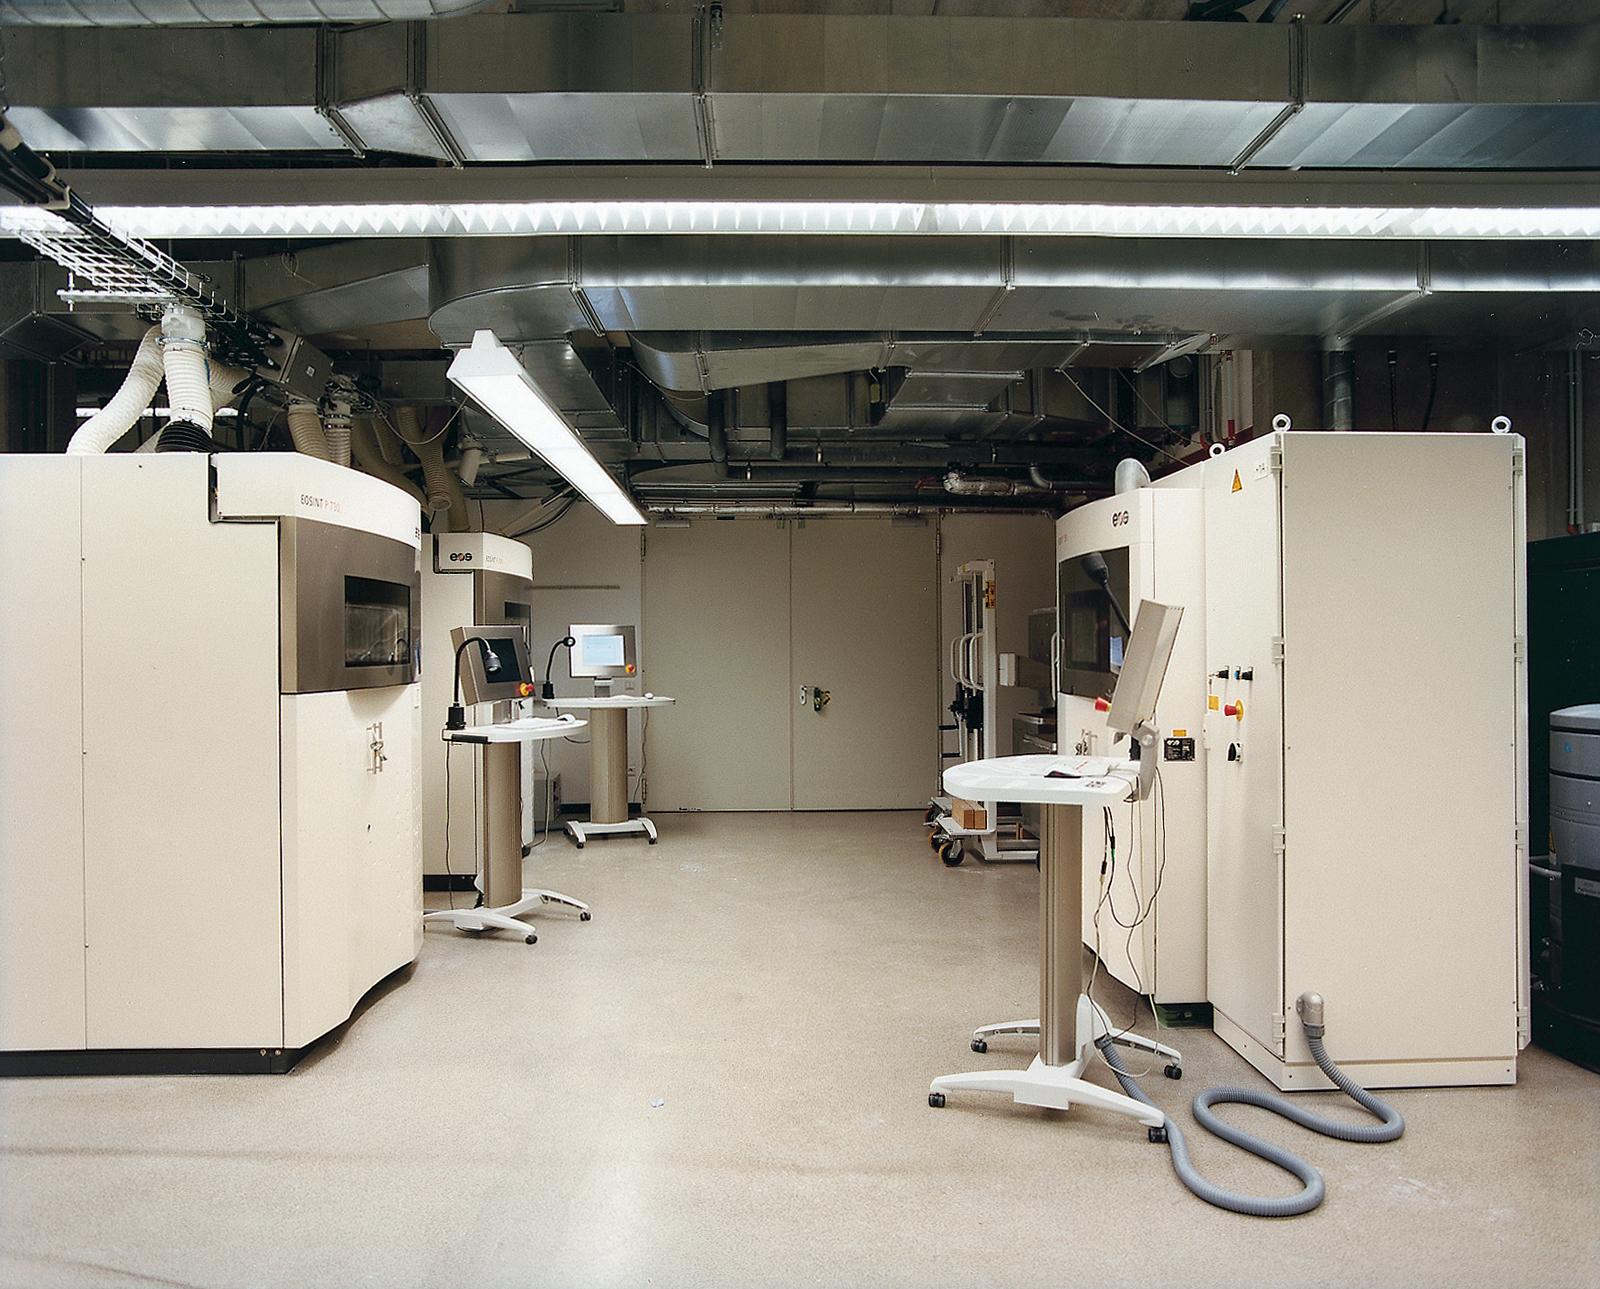 FOC Manufacturing Facility in Munich Germany